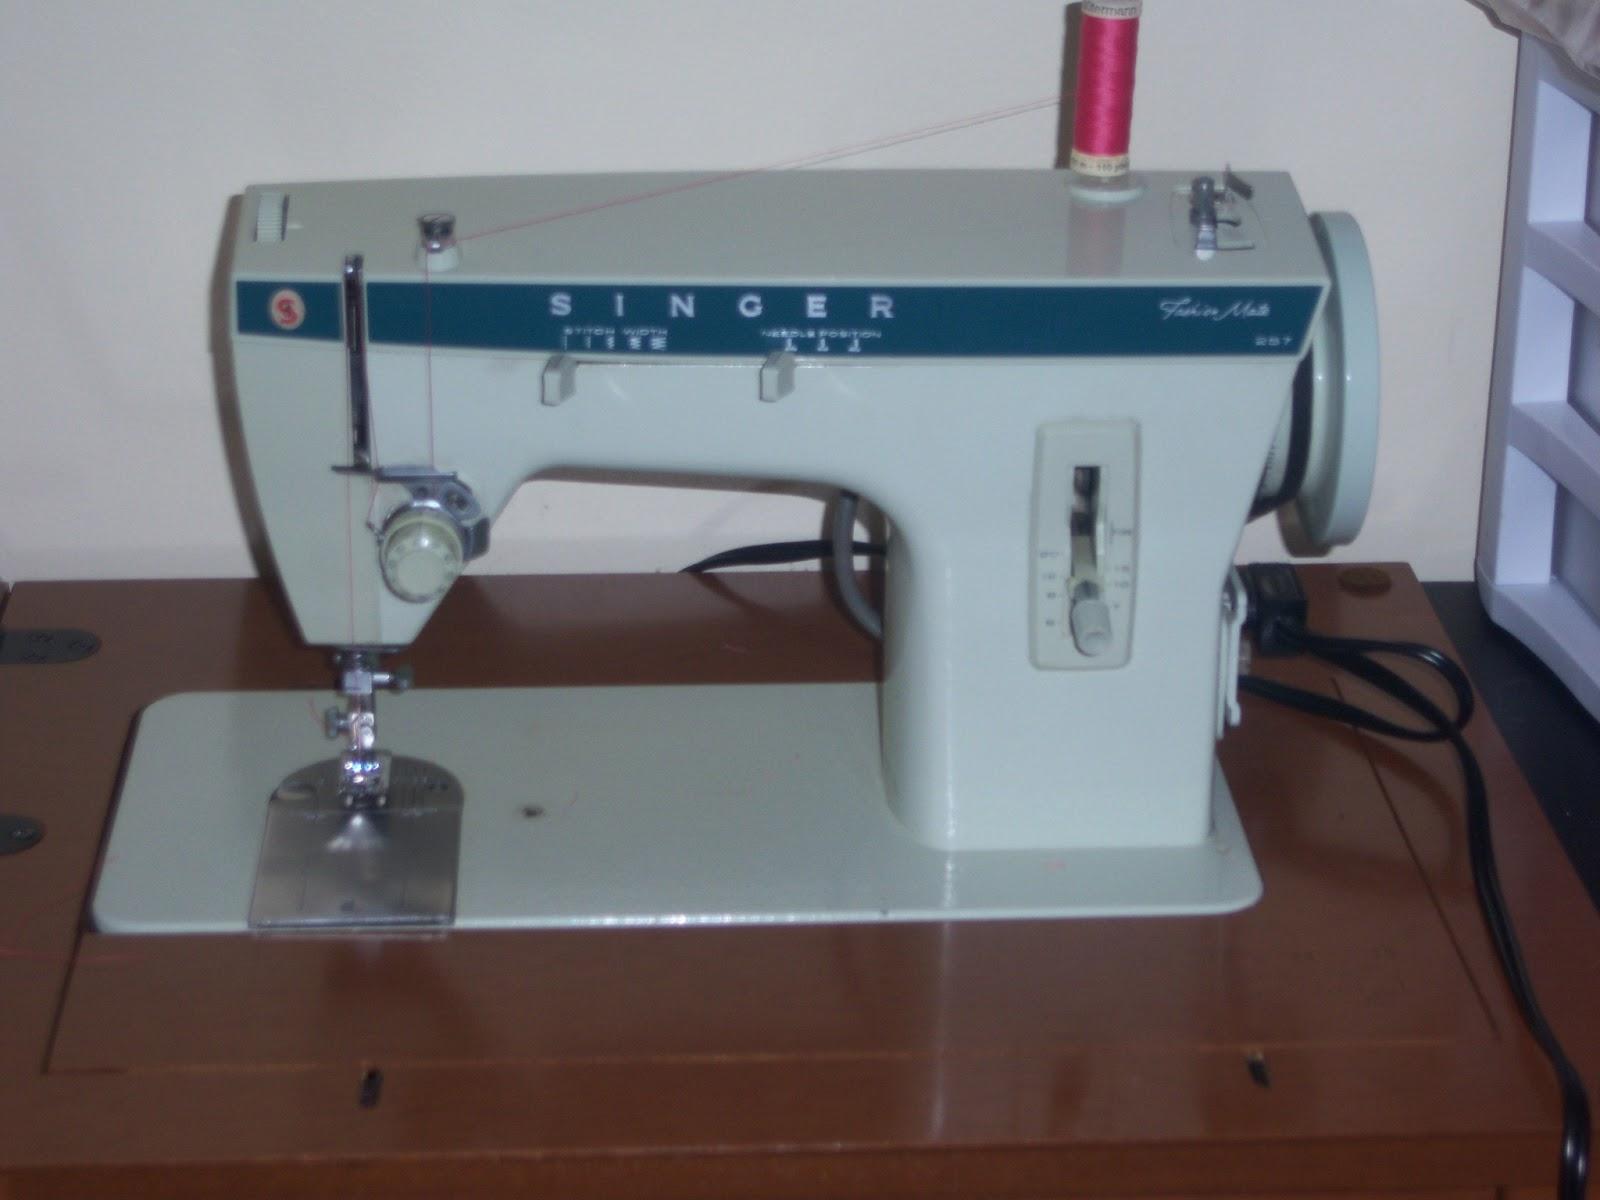 Elna Sewing Machine Parts Diagram Lotus In Water Plant Name Bing